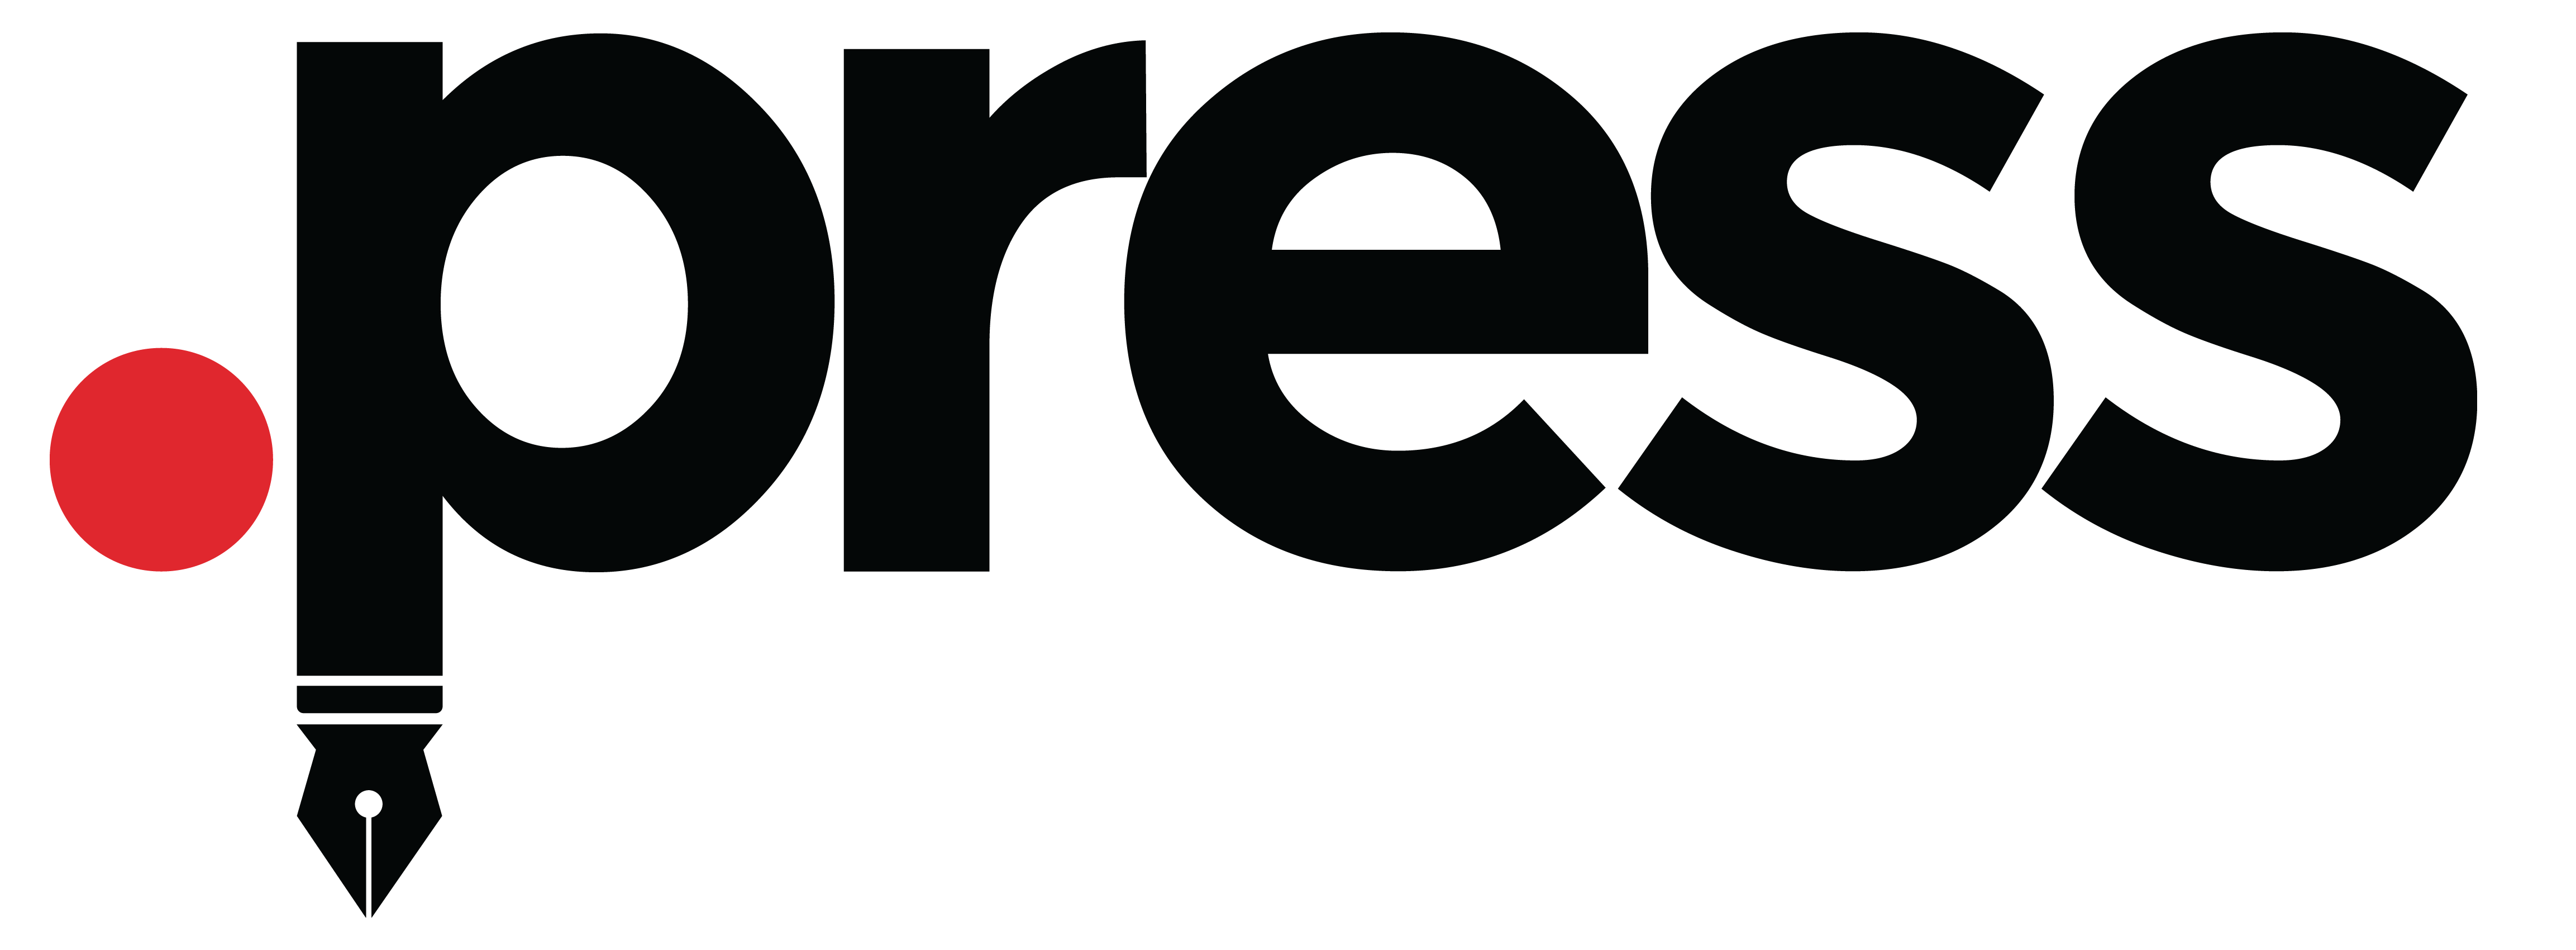 press hexonet wiki